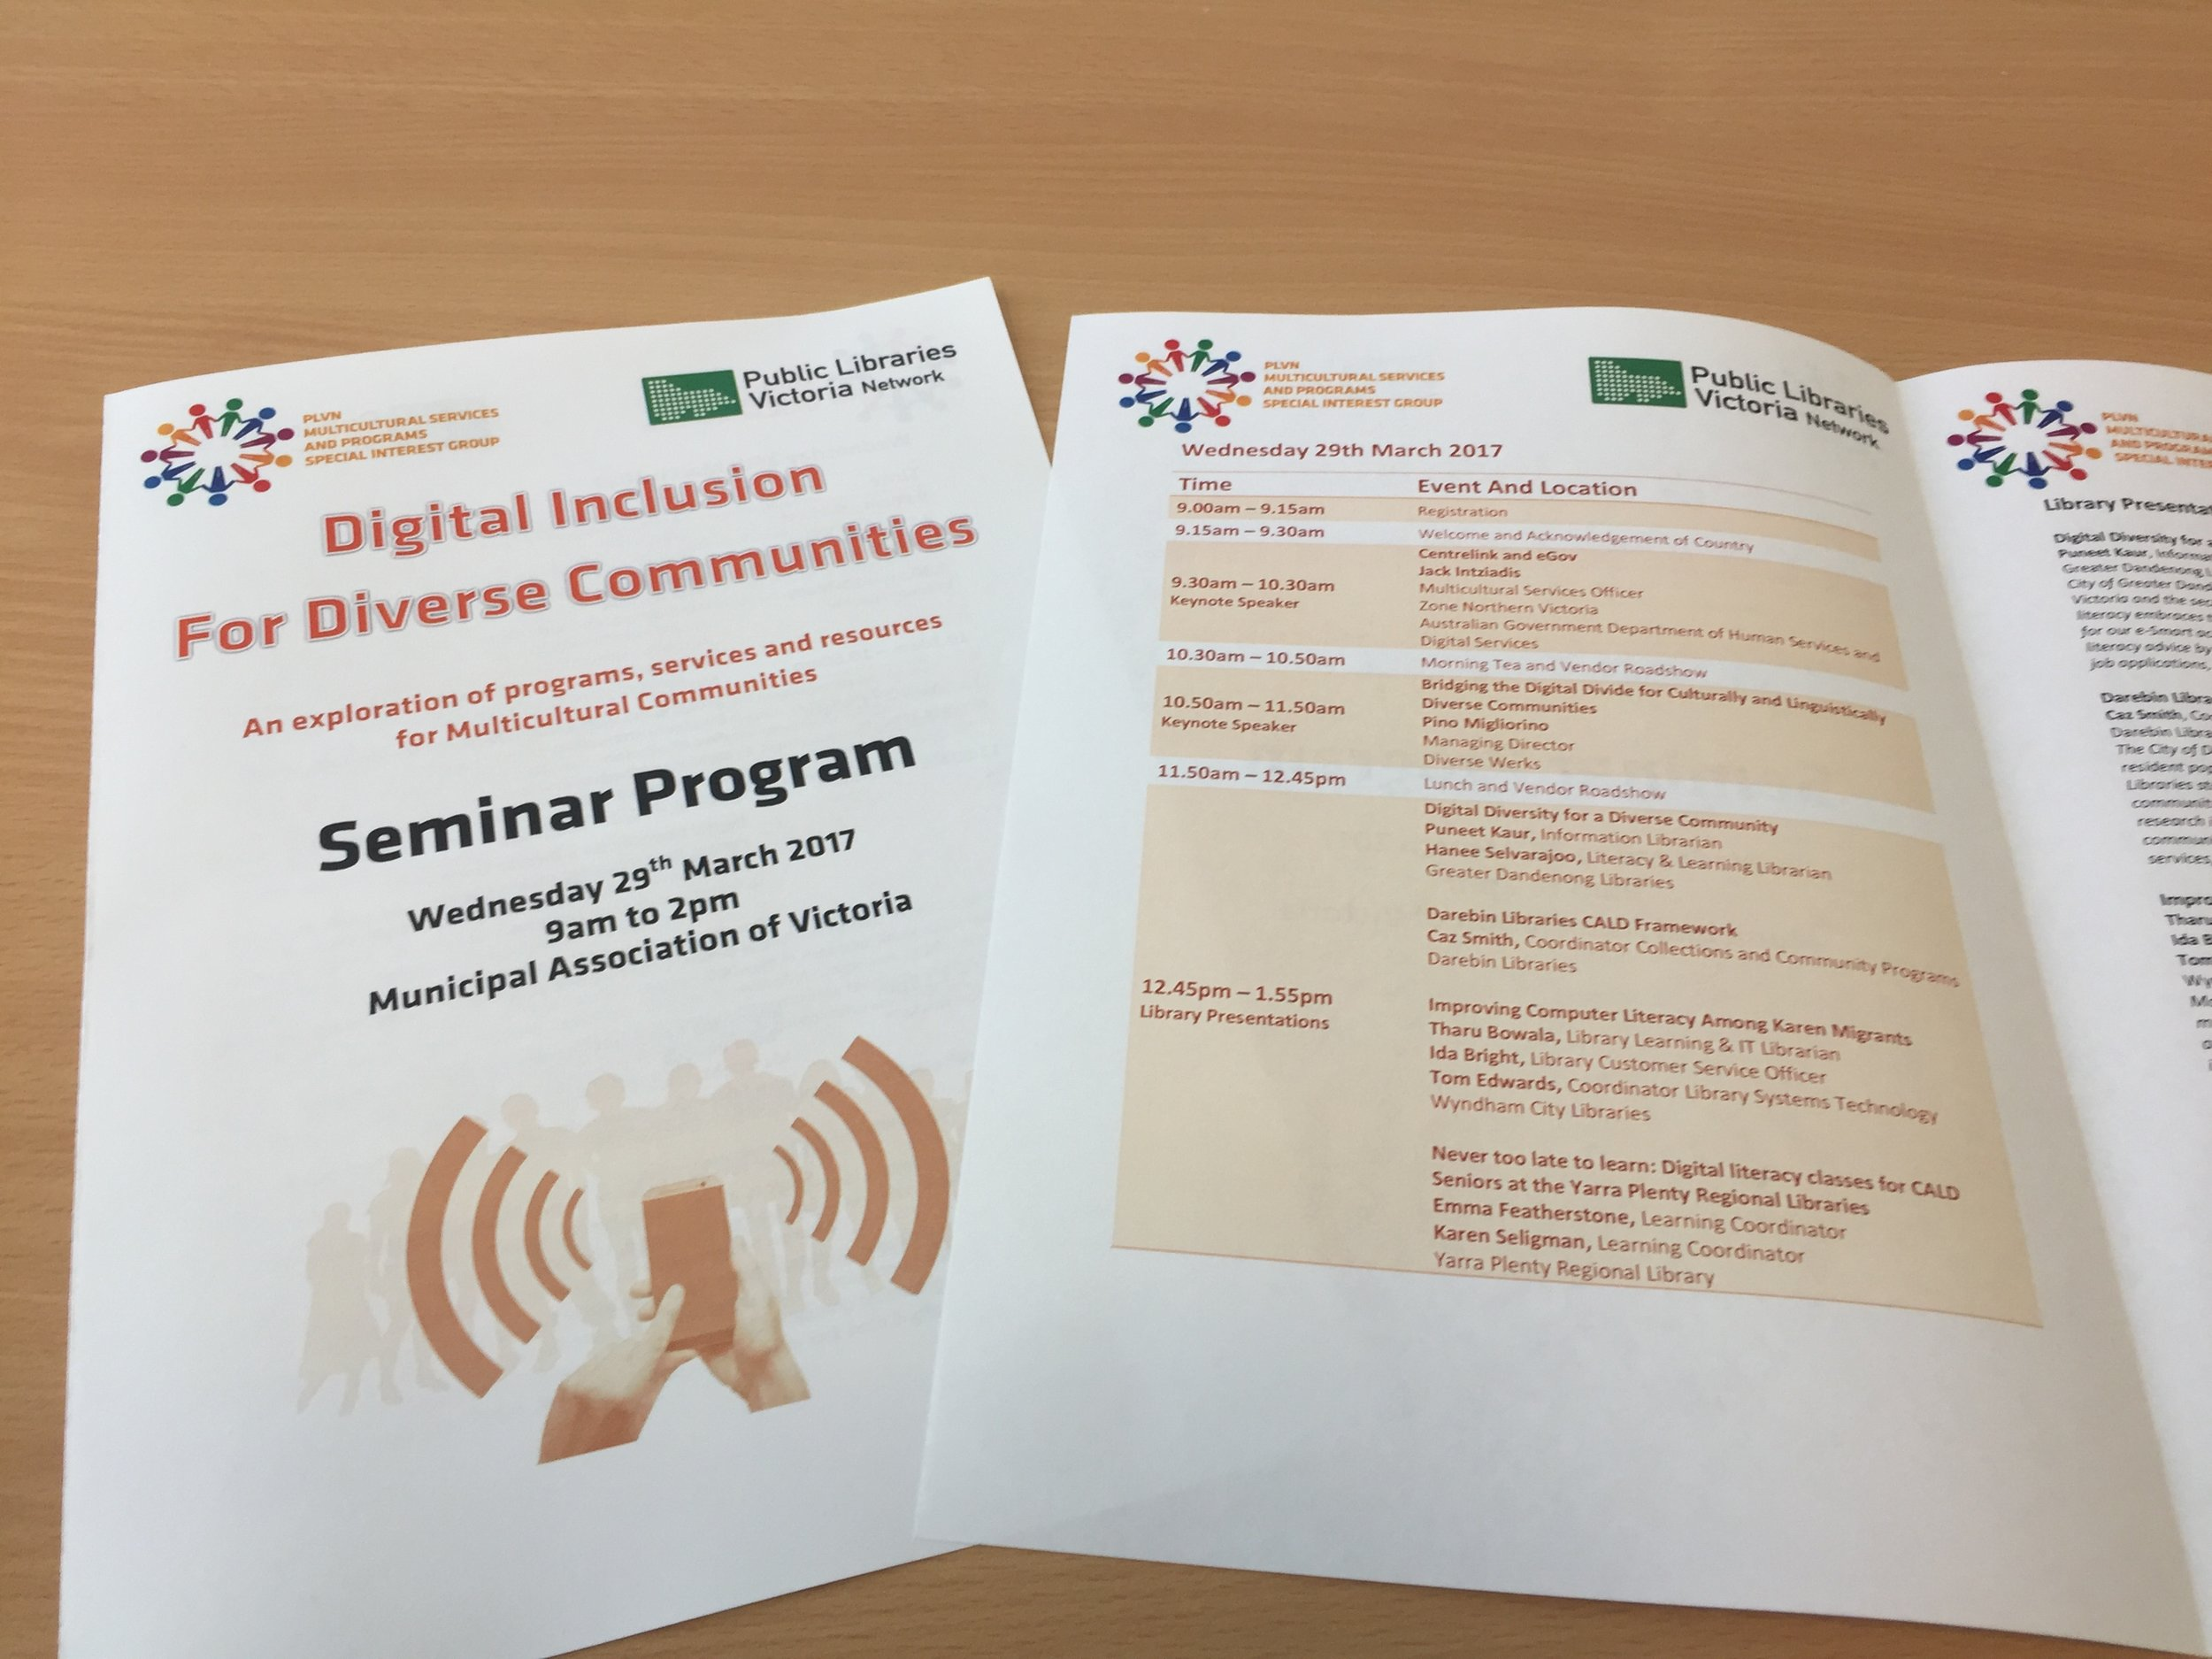 2017 Digital Inclusion for Diverse Communities Seminar Program